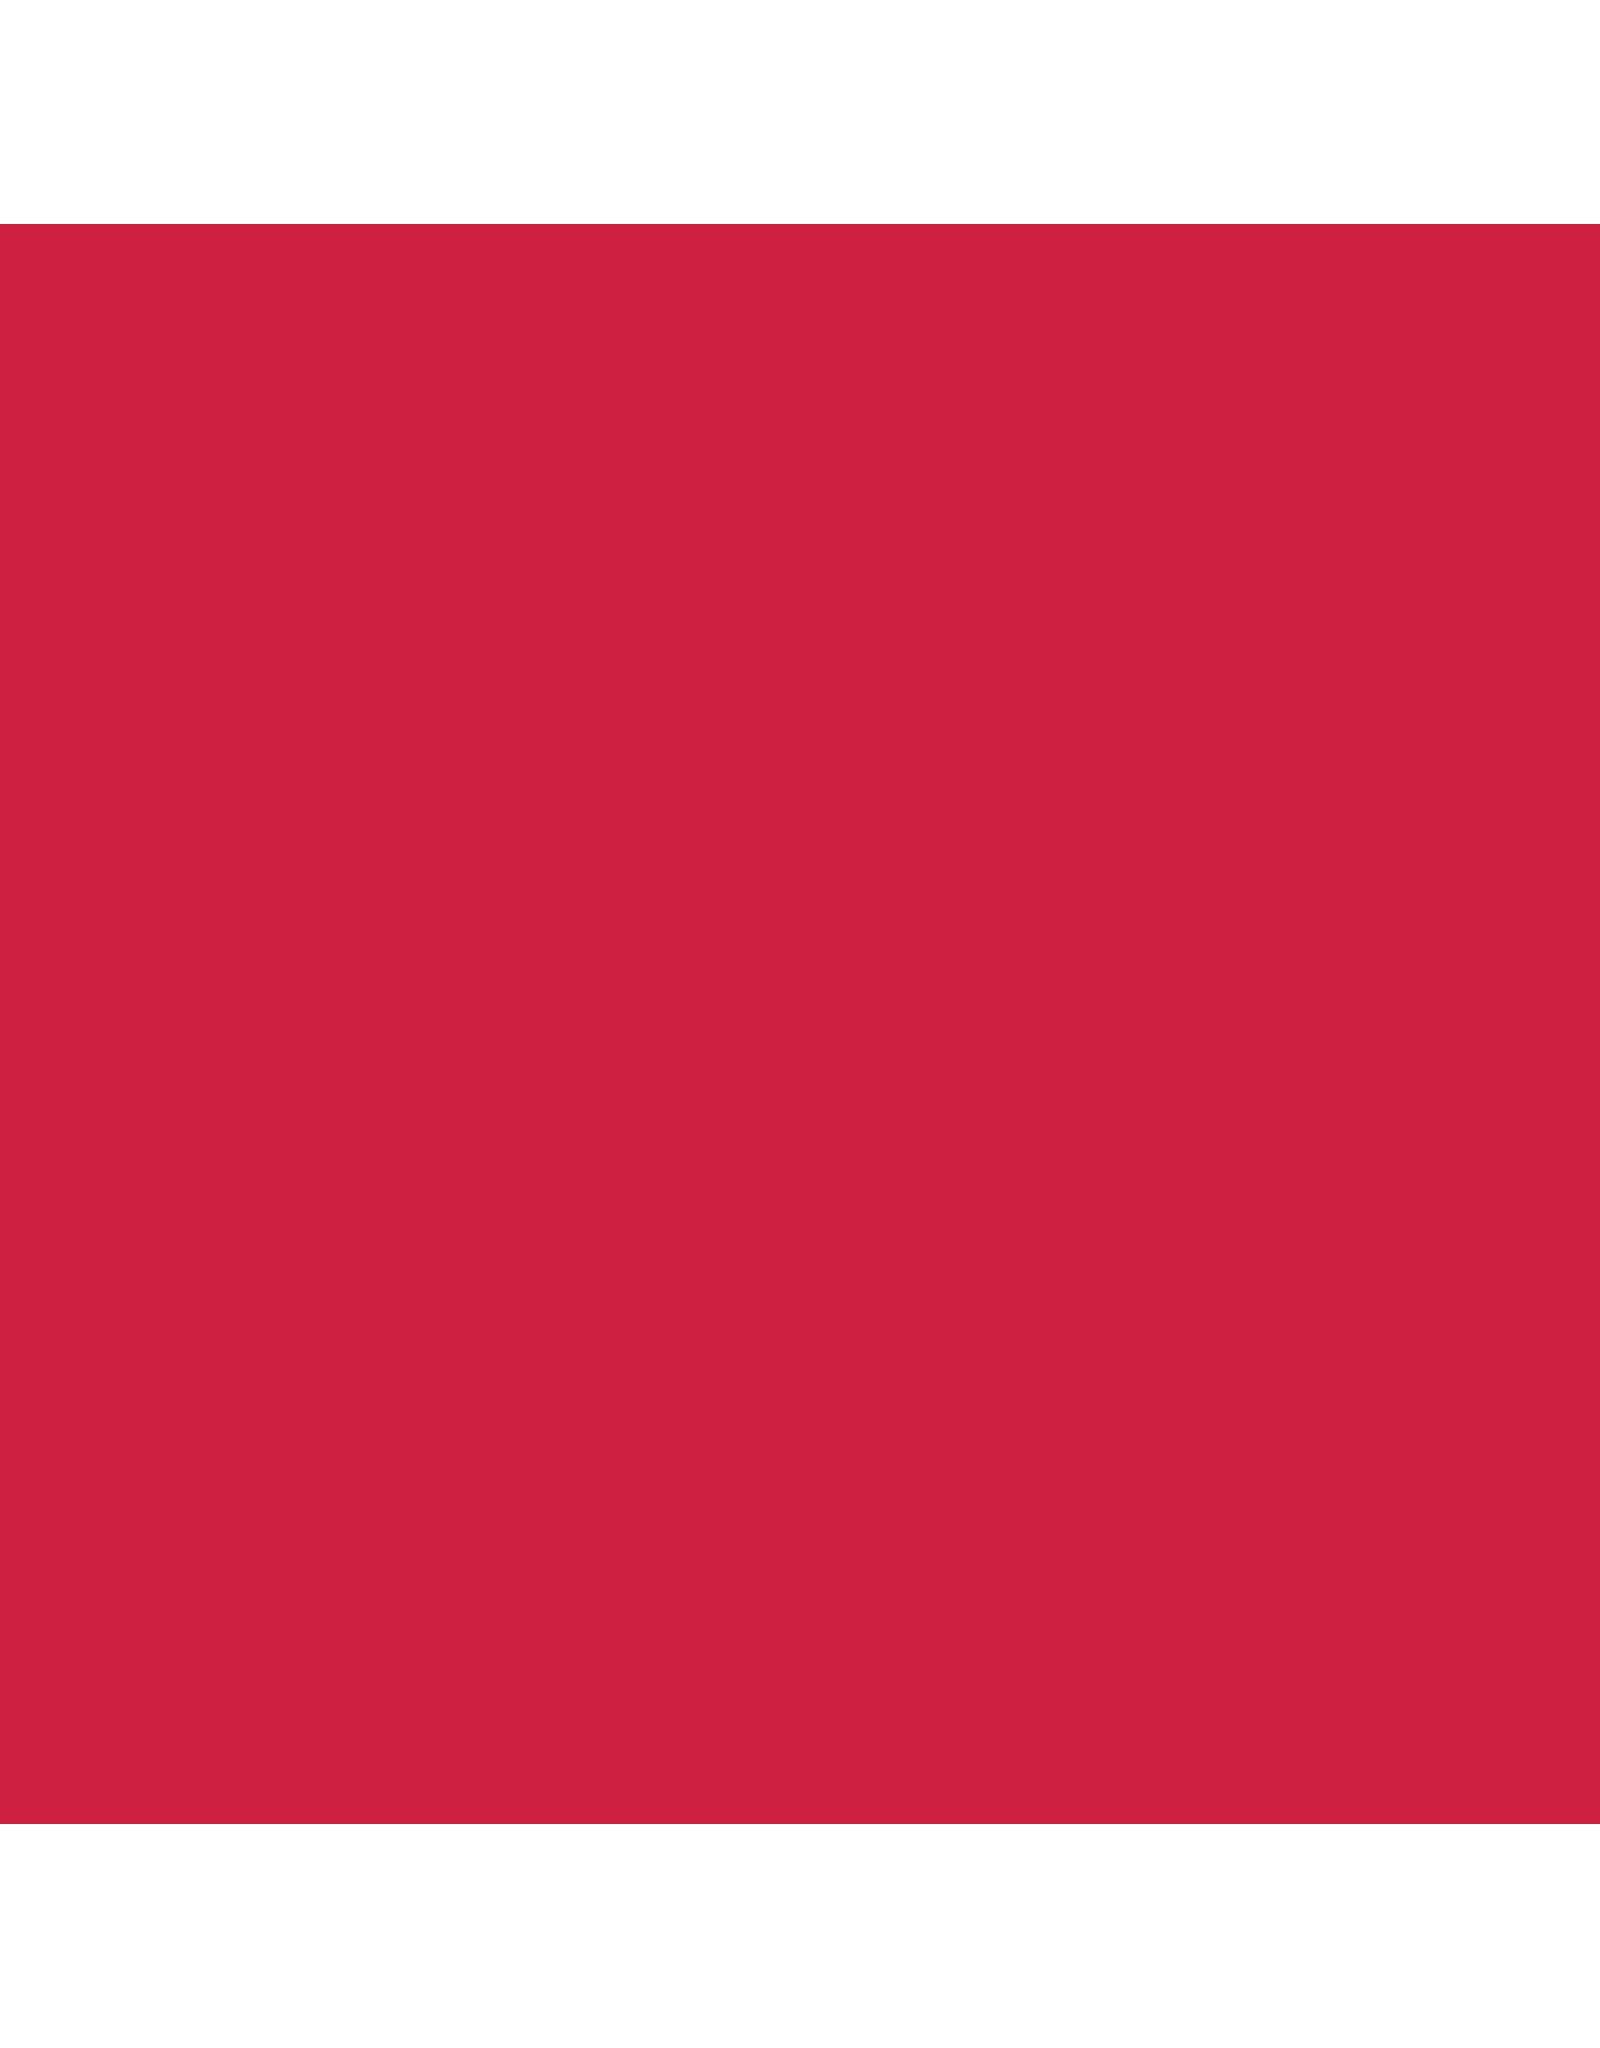 Andover Fabrics Century Solids, Strawberry, Fabric Half-Yards